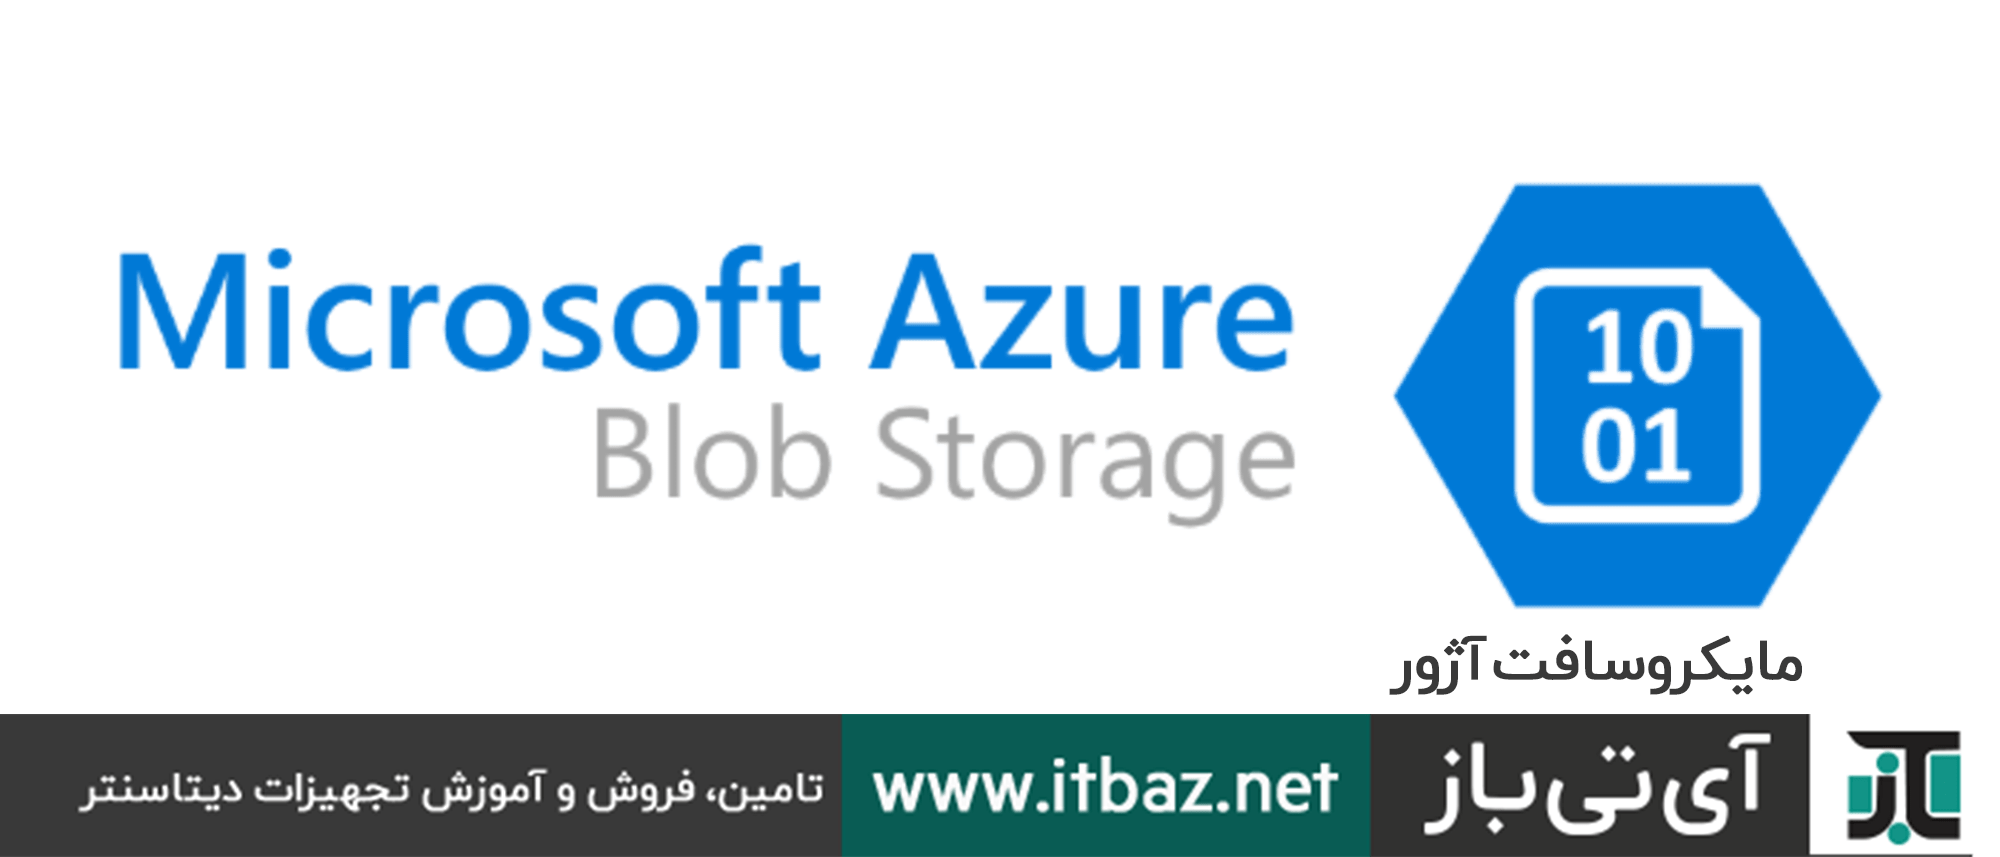 مایکروسافت اژور ، اژور مایکروسافت ، Microsoft Azure ، Azure